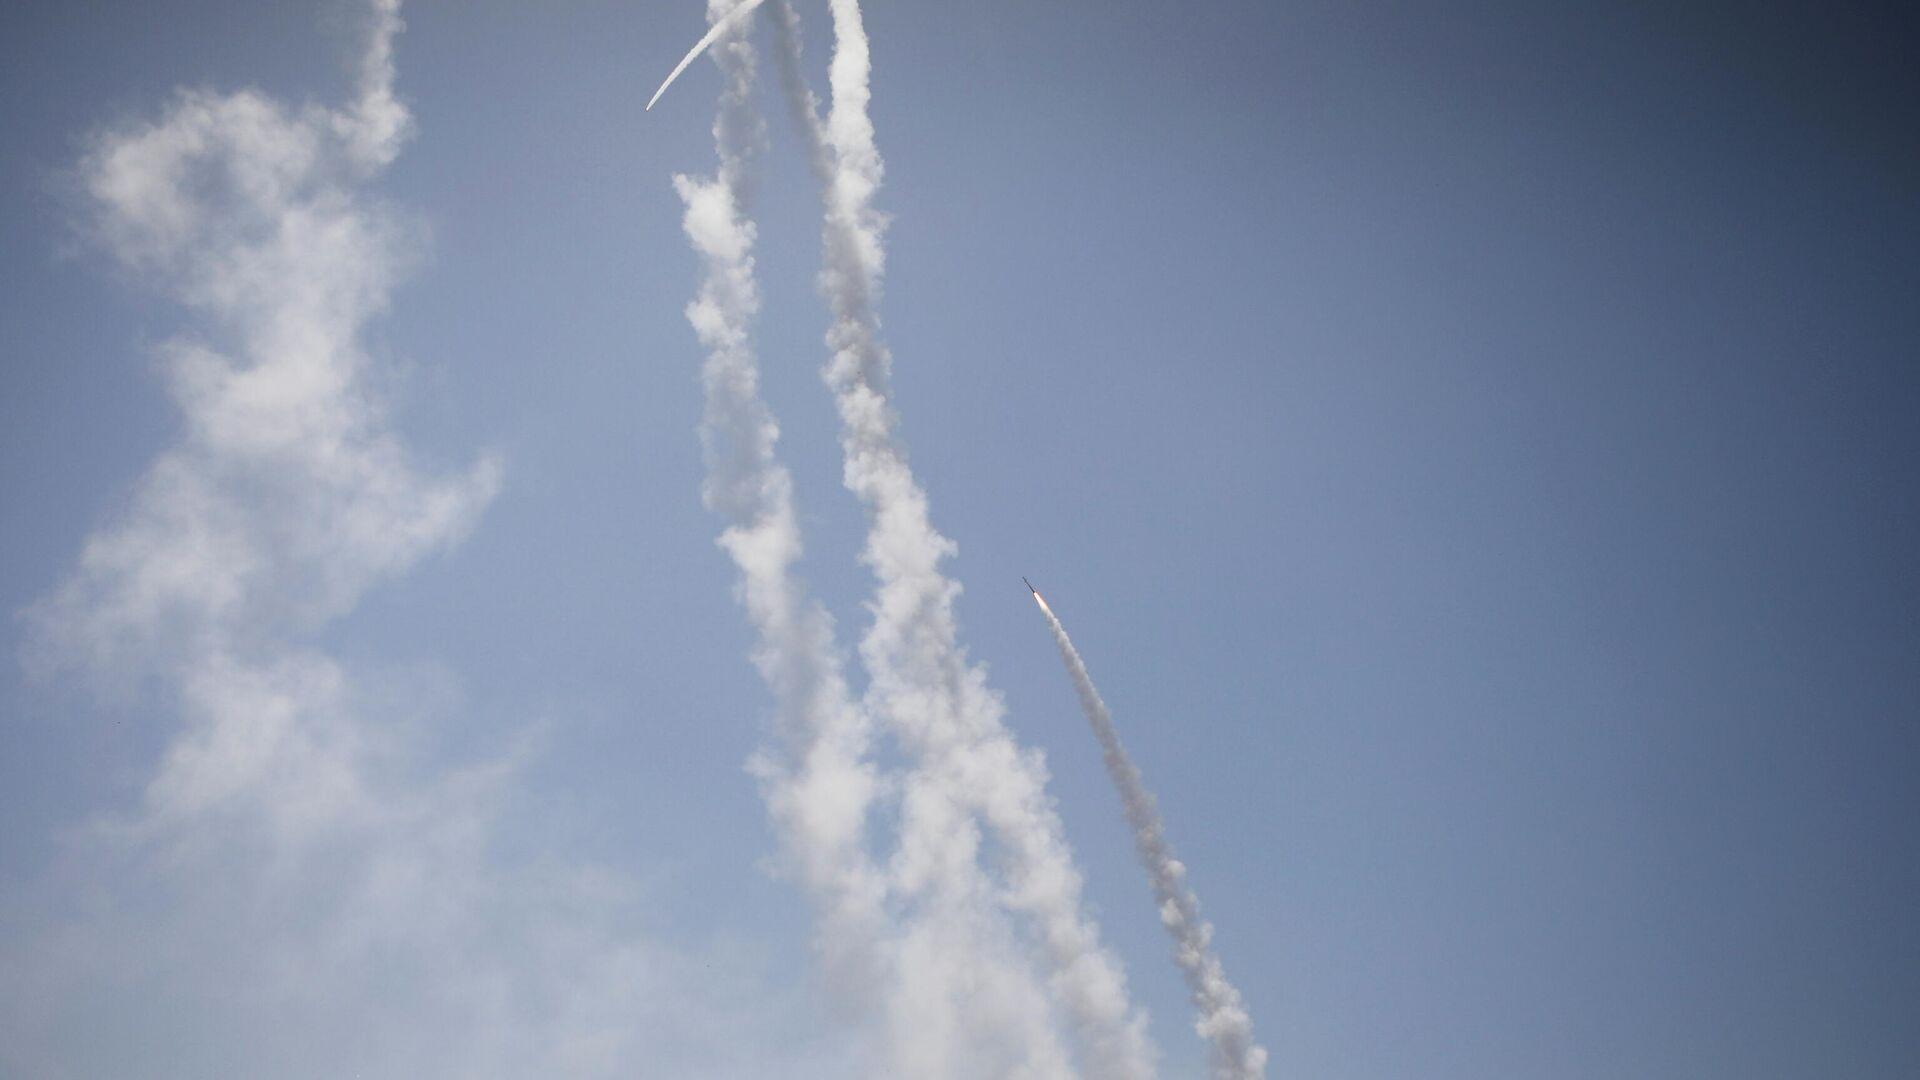 Los ataques desde Franja de Gaza - Sputnik Mundo, 1920, 11.05.2021